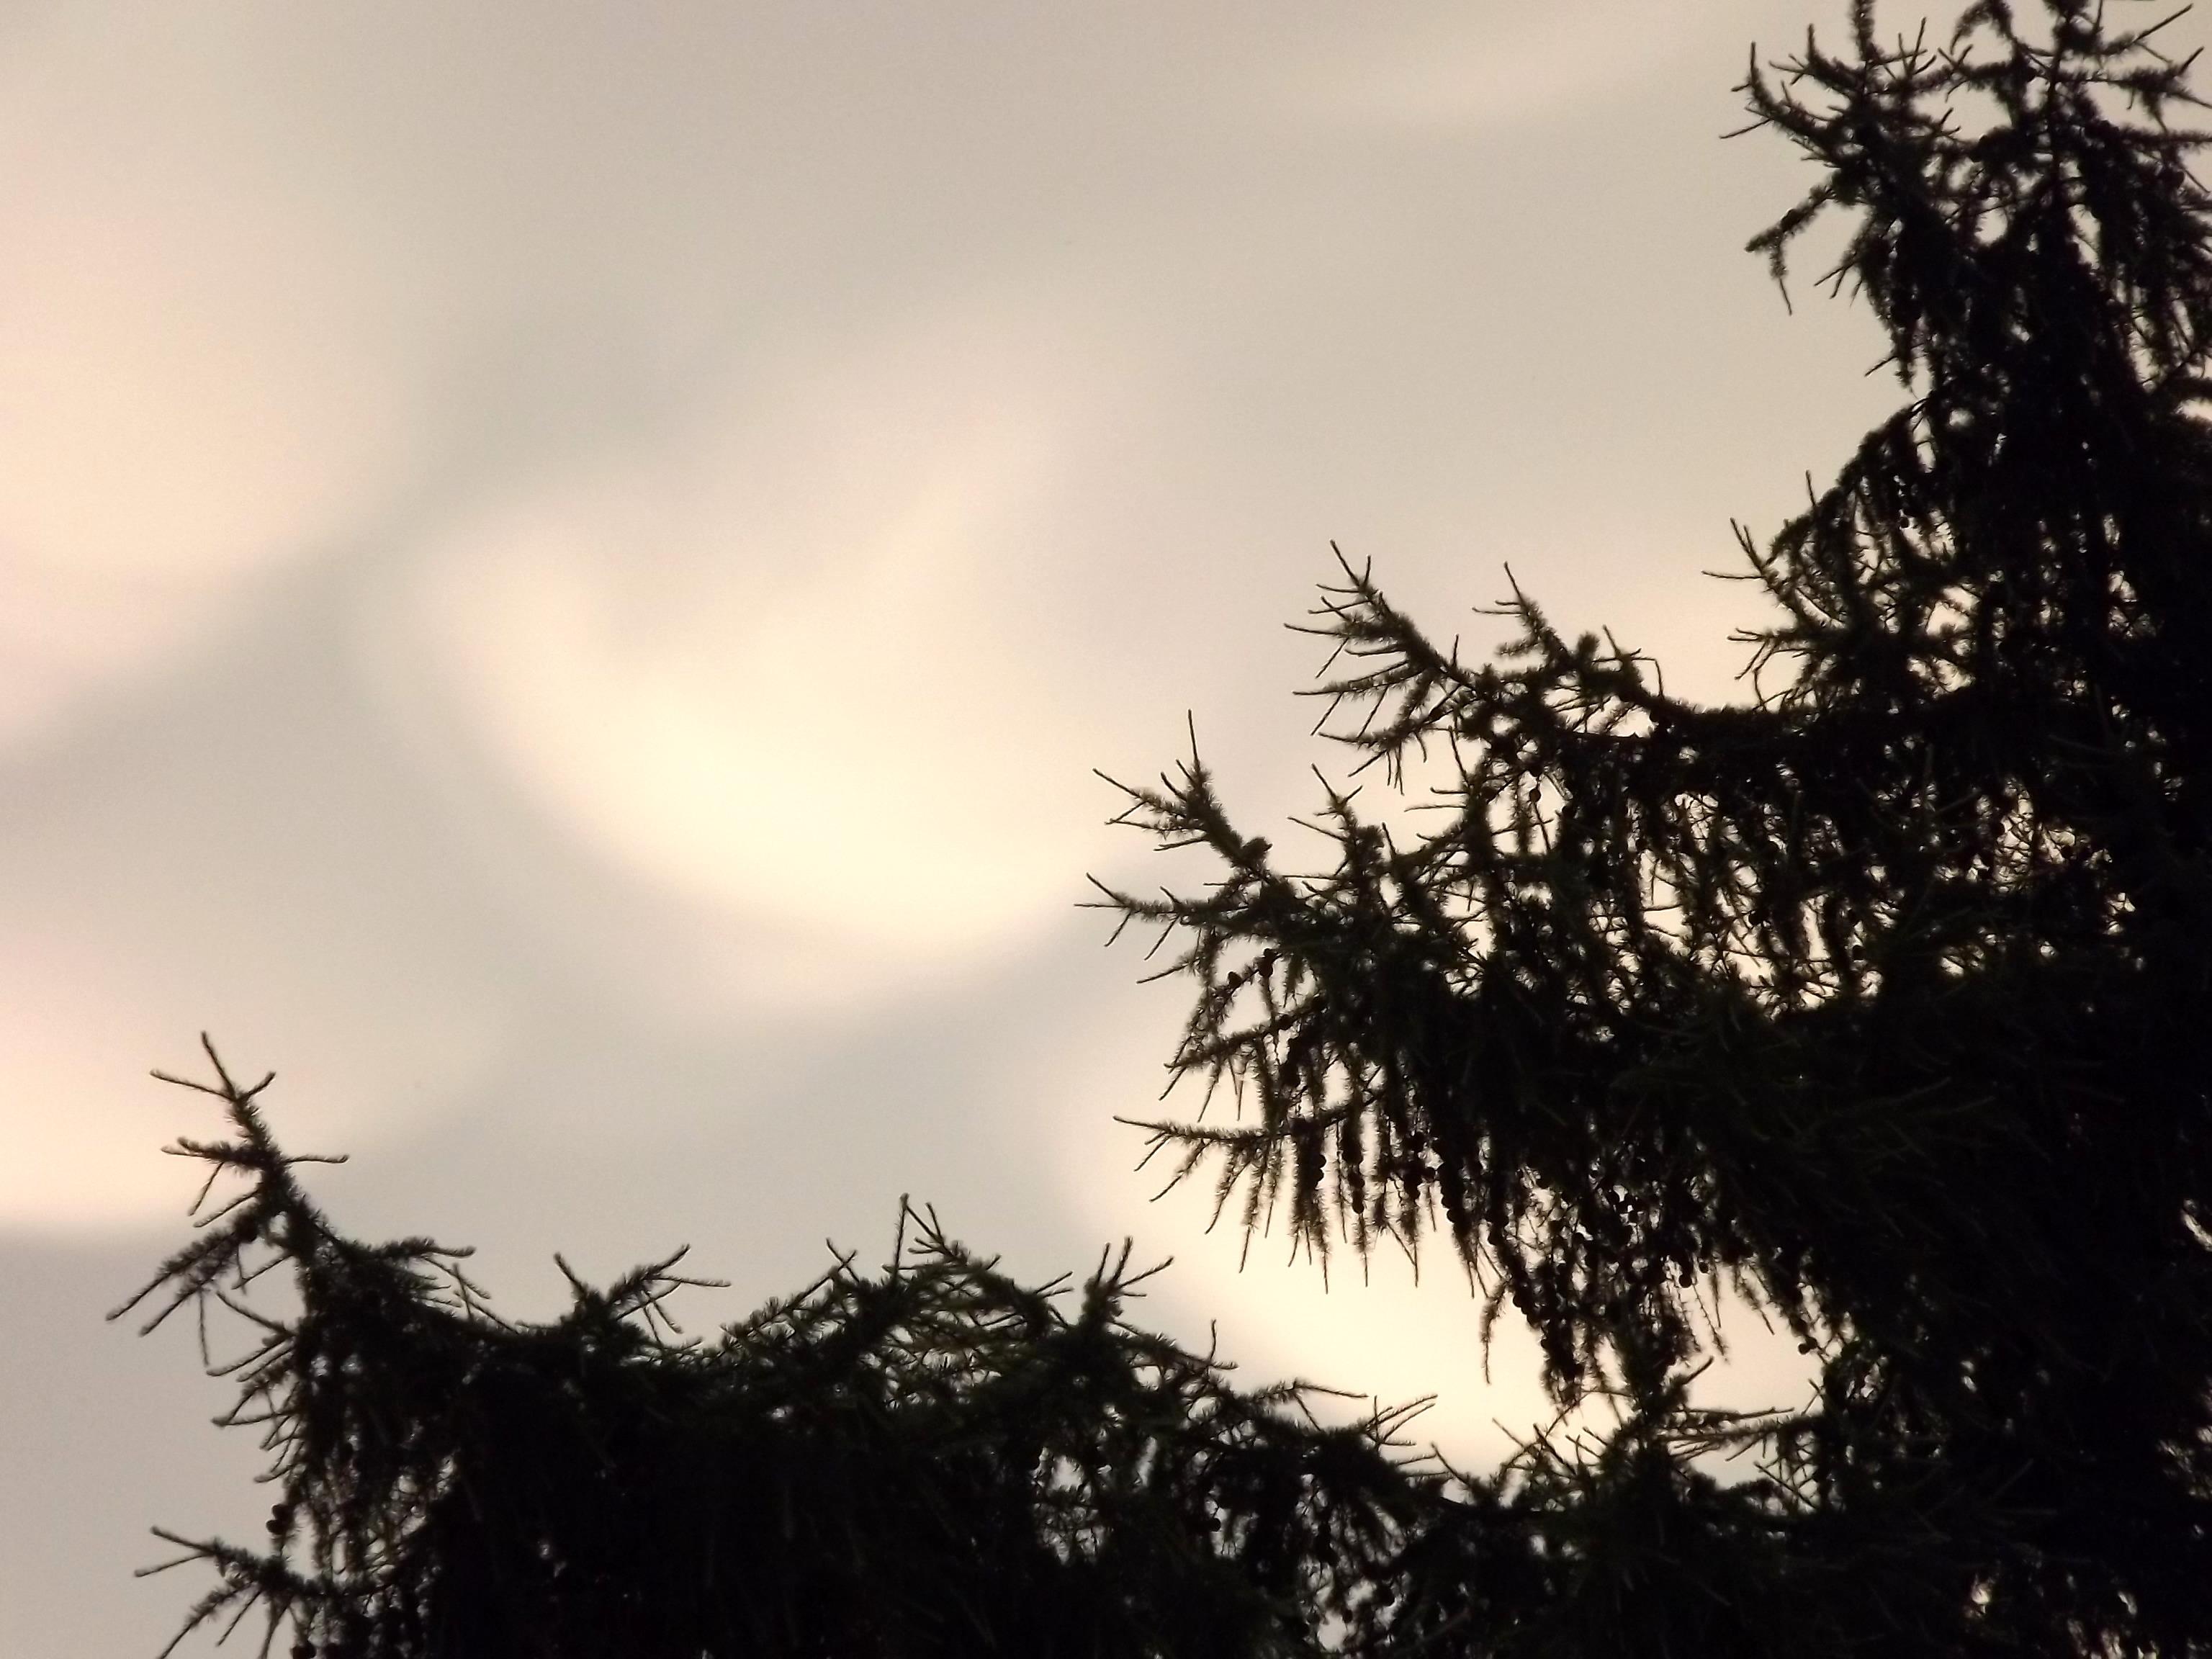 6252-himmel-wolken-zuckerwatte-tanne